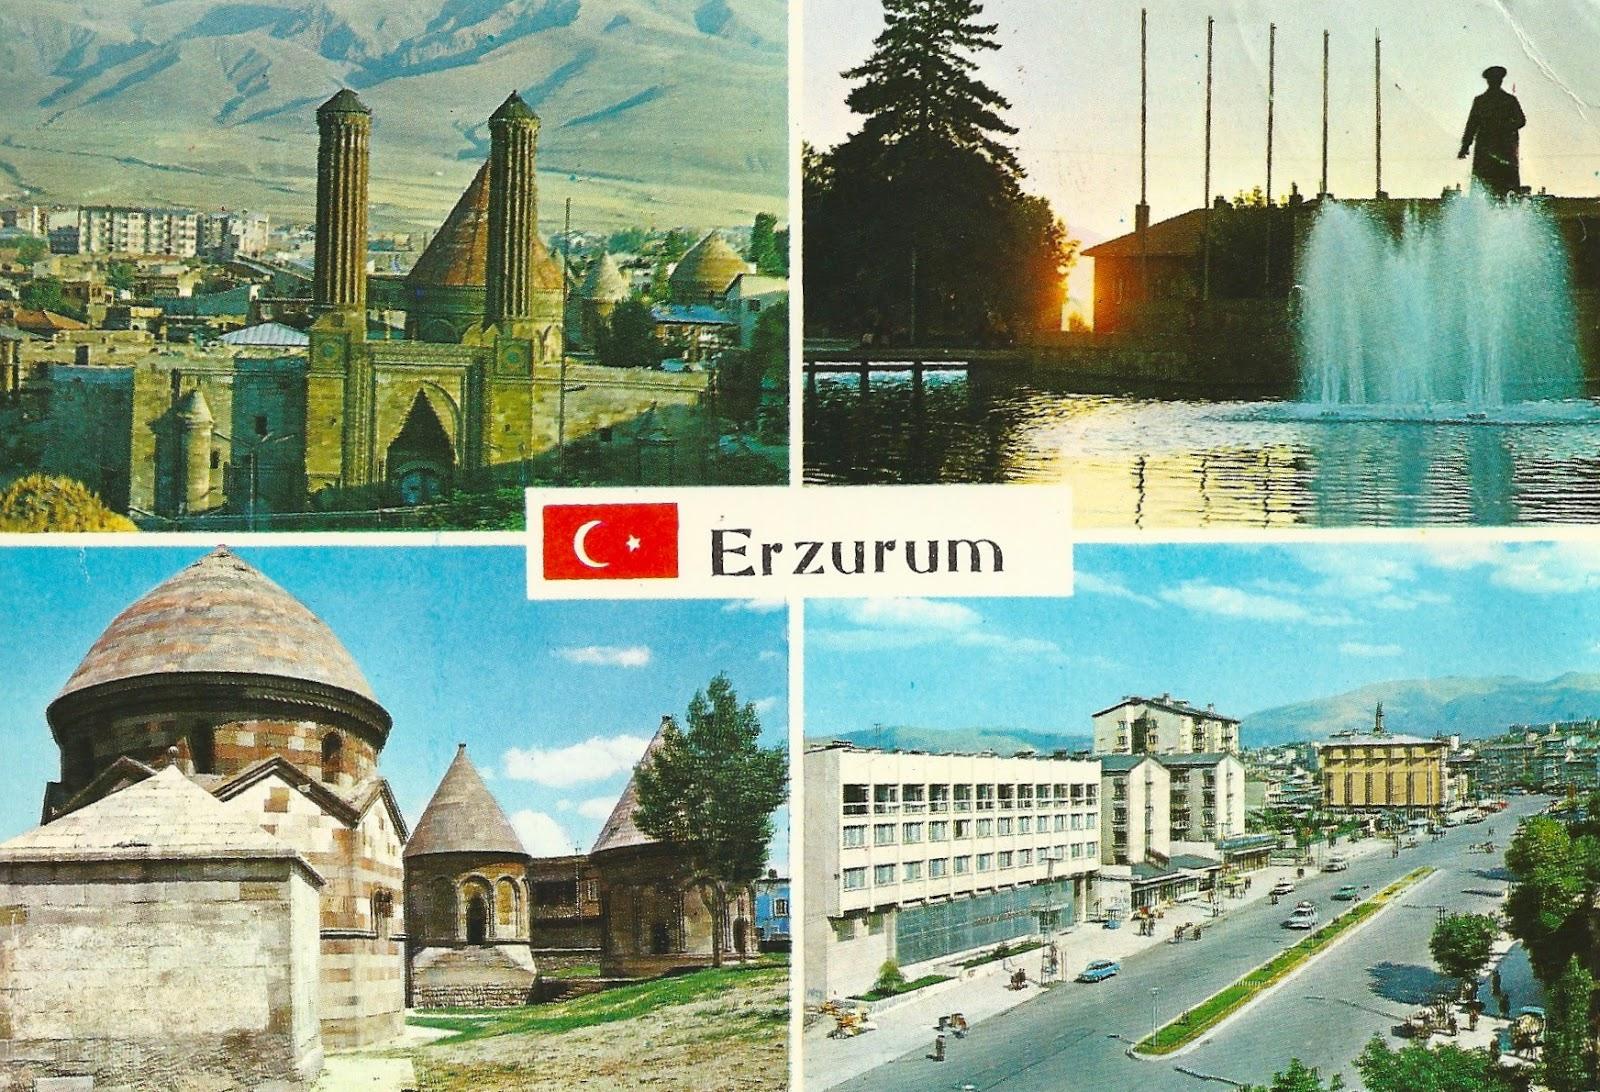 Erzurum Turkey  City pictures : Erzurum, Turkey